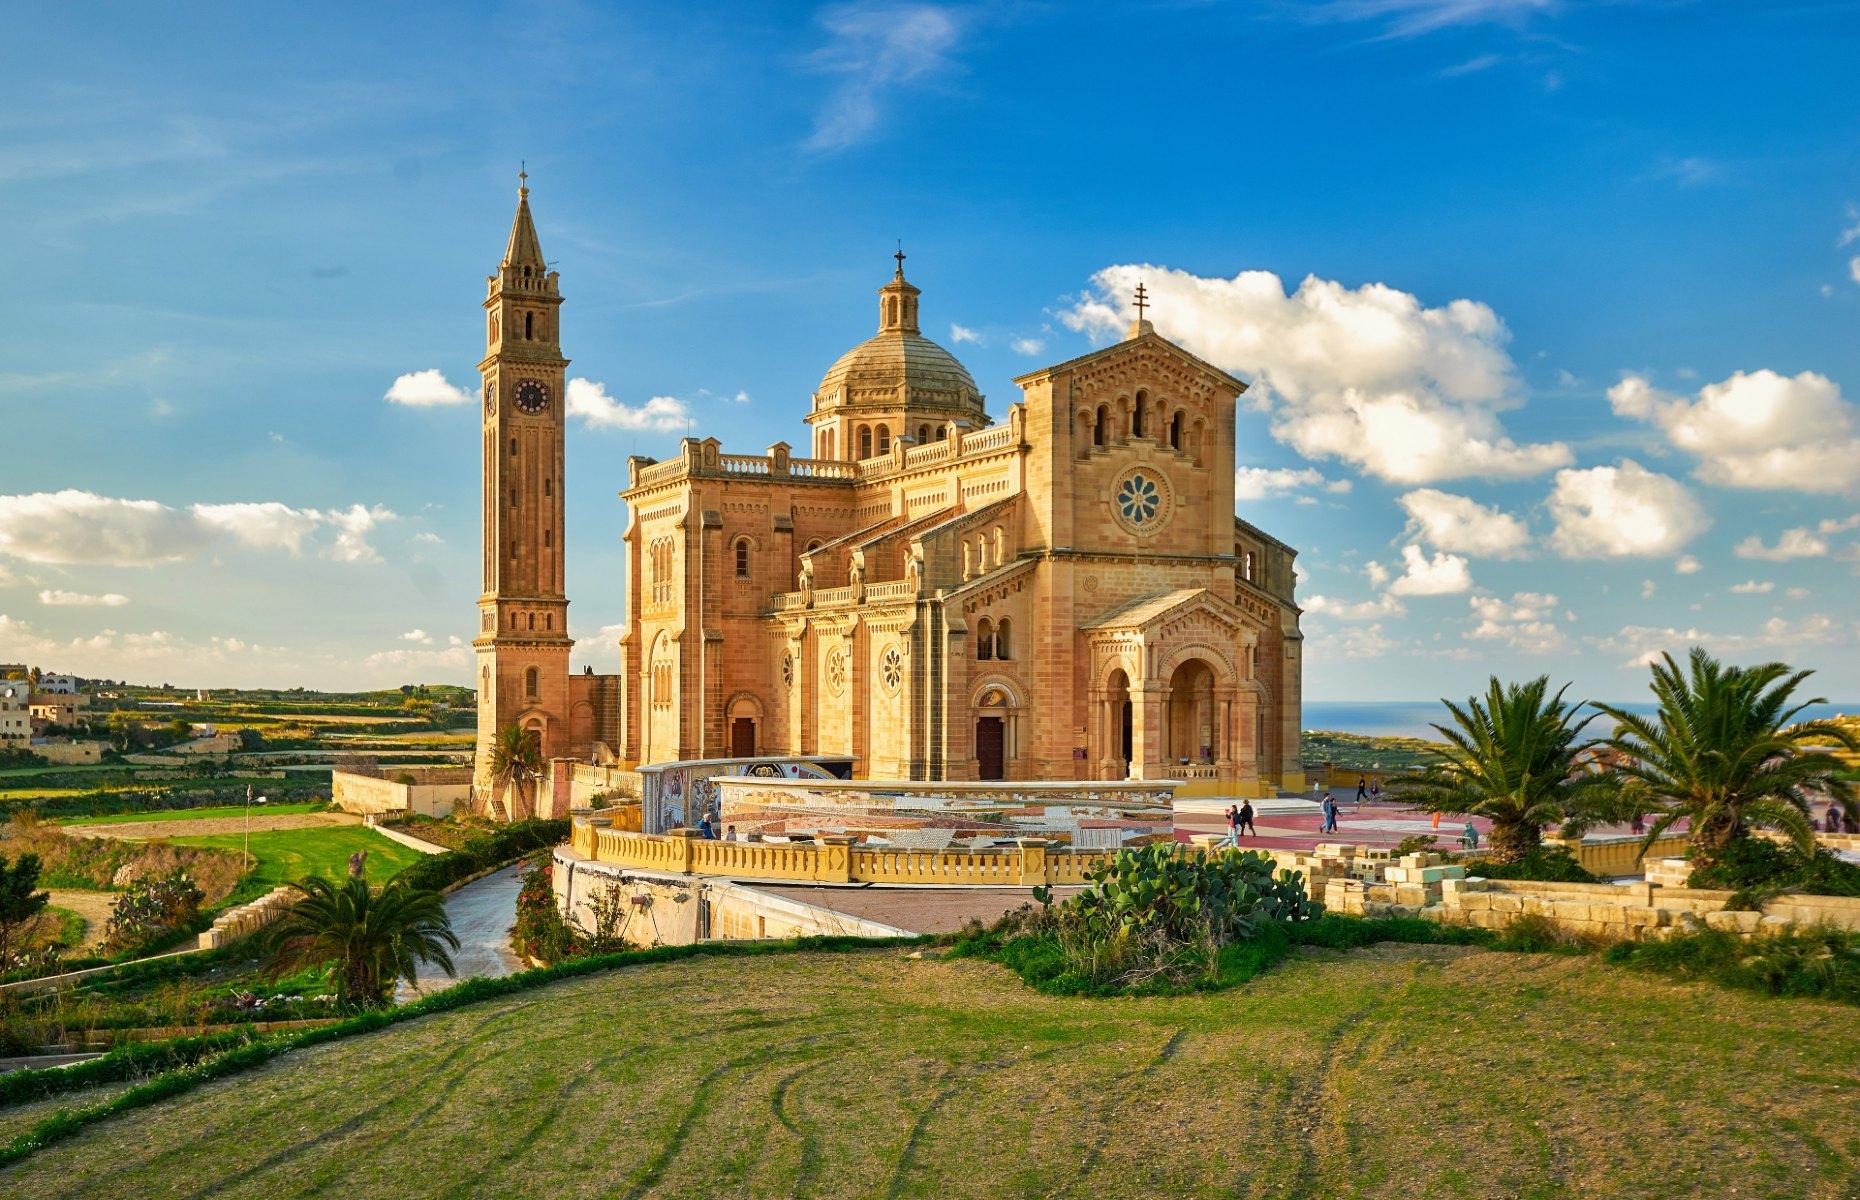 Ta'Pinu in Gozo (Image: Vladimir Zhoga/Shutterstock)